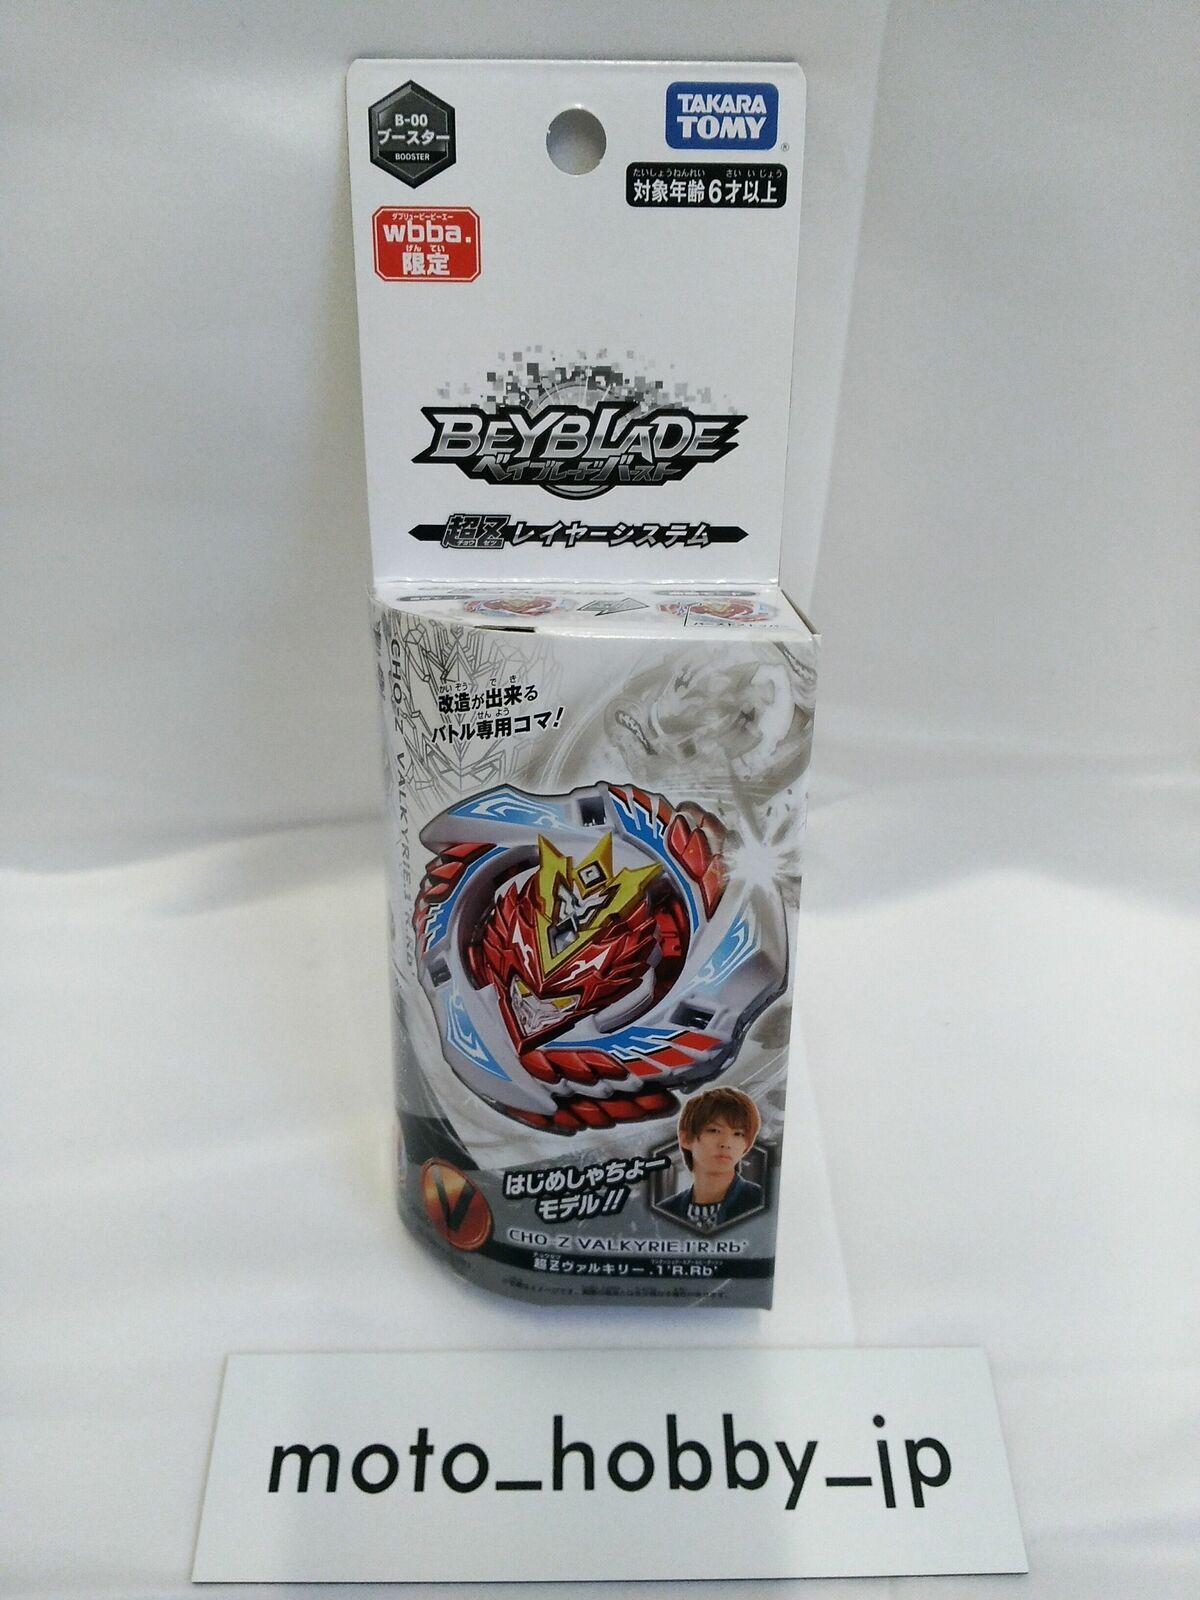 Beyblade Burst B-00 Cho-Z Valkyrie 0.3mr.rb' Wbba. Store Limitiert Ver. ab Japan